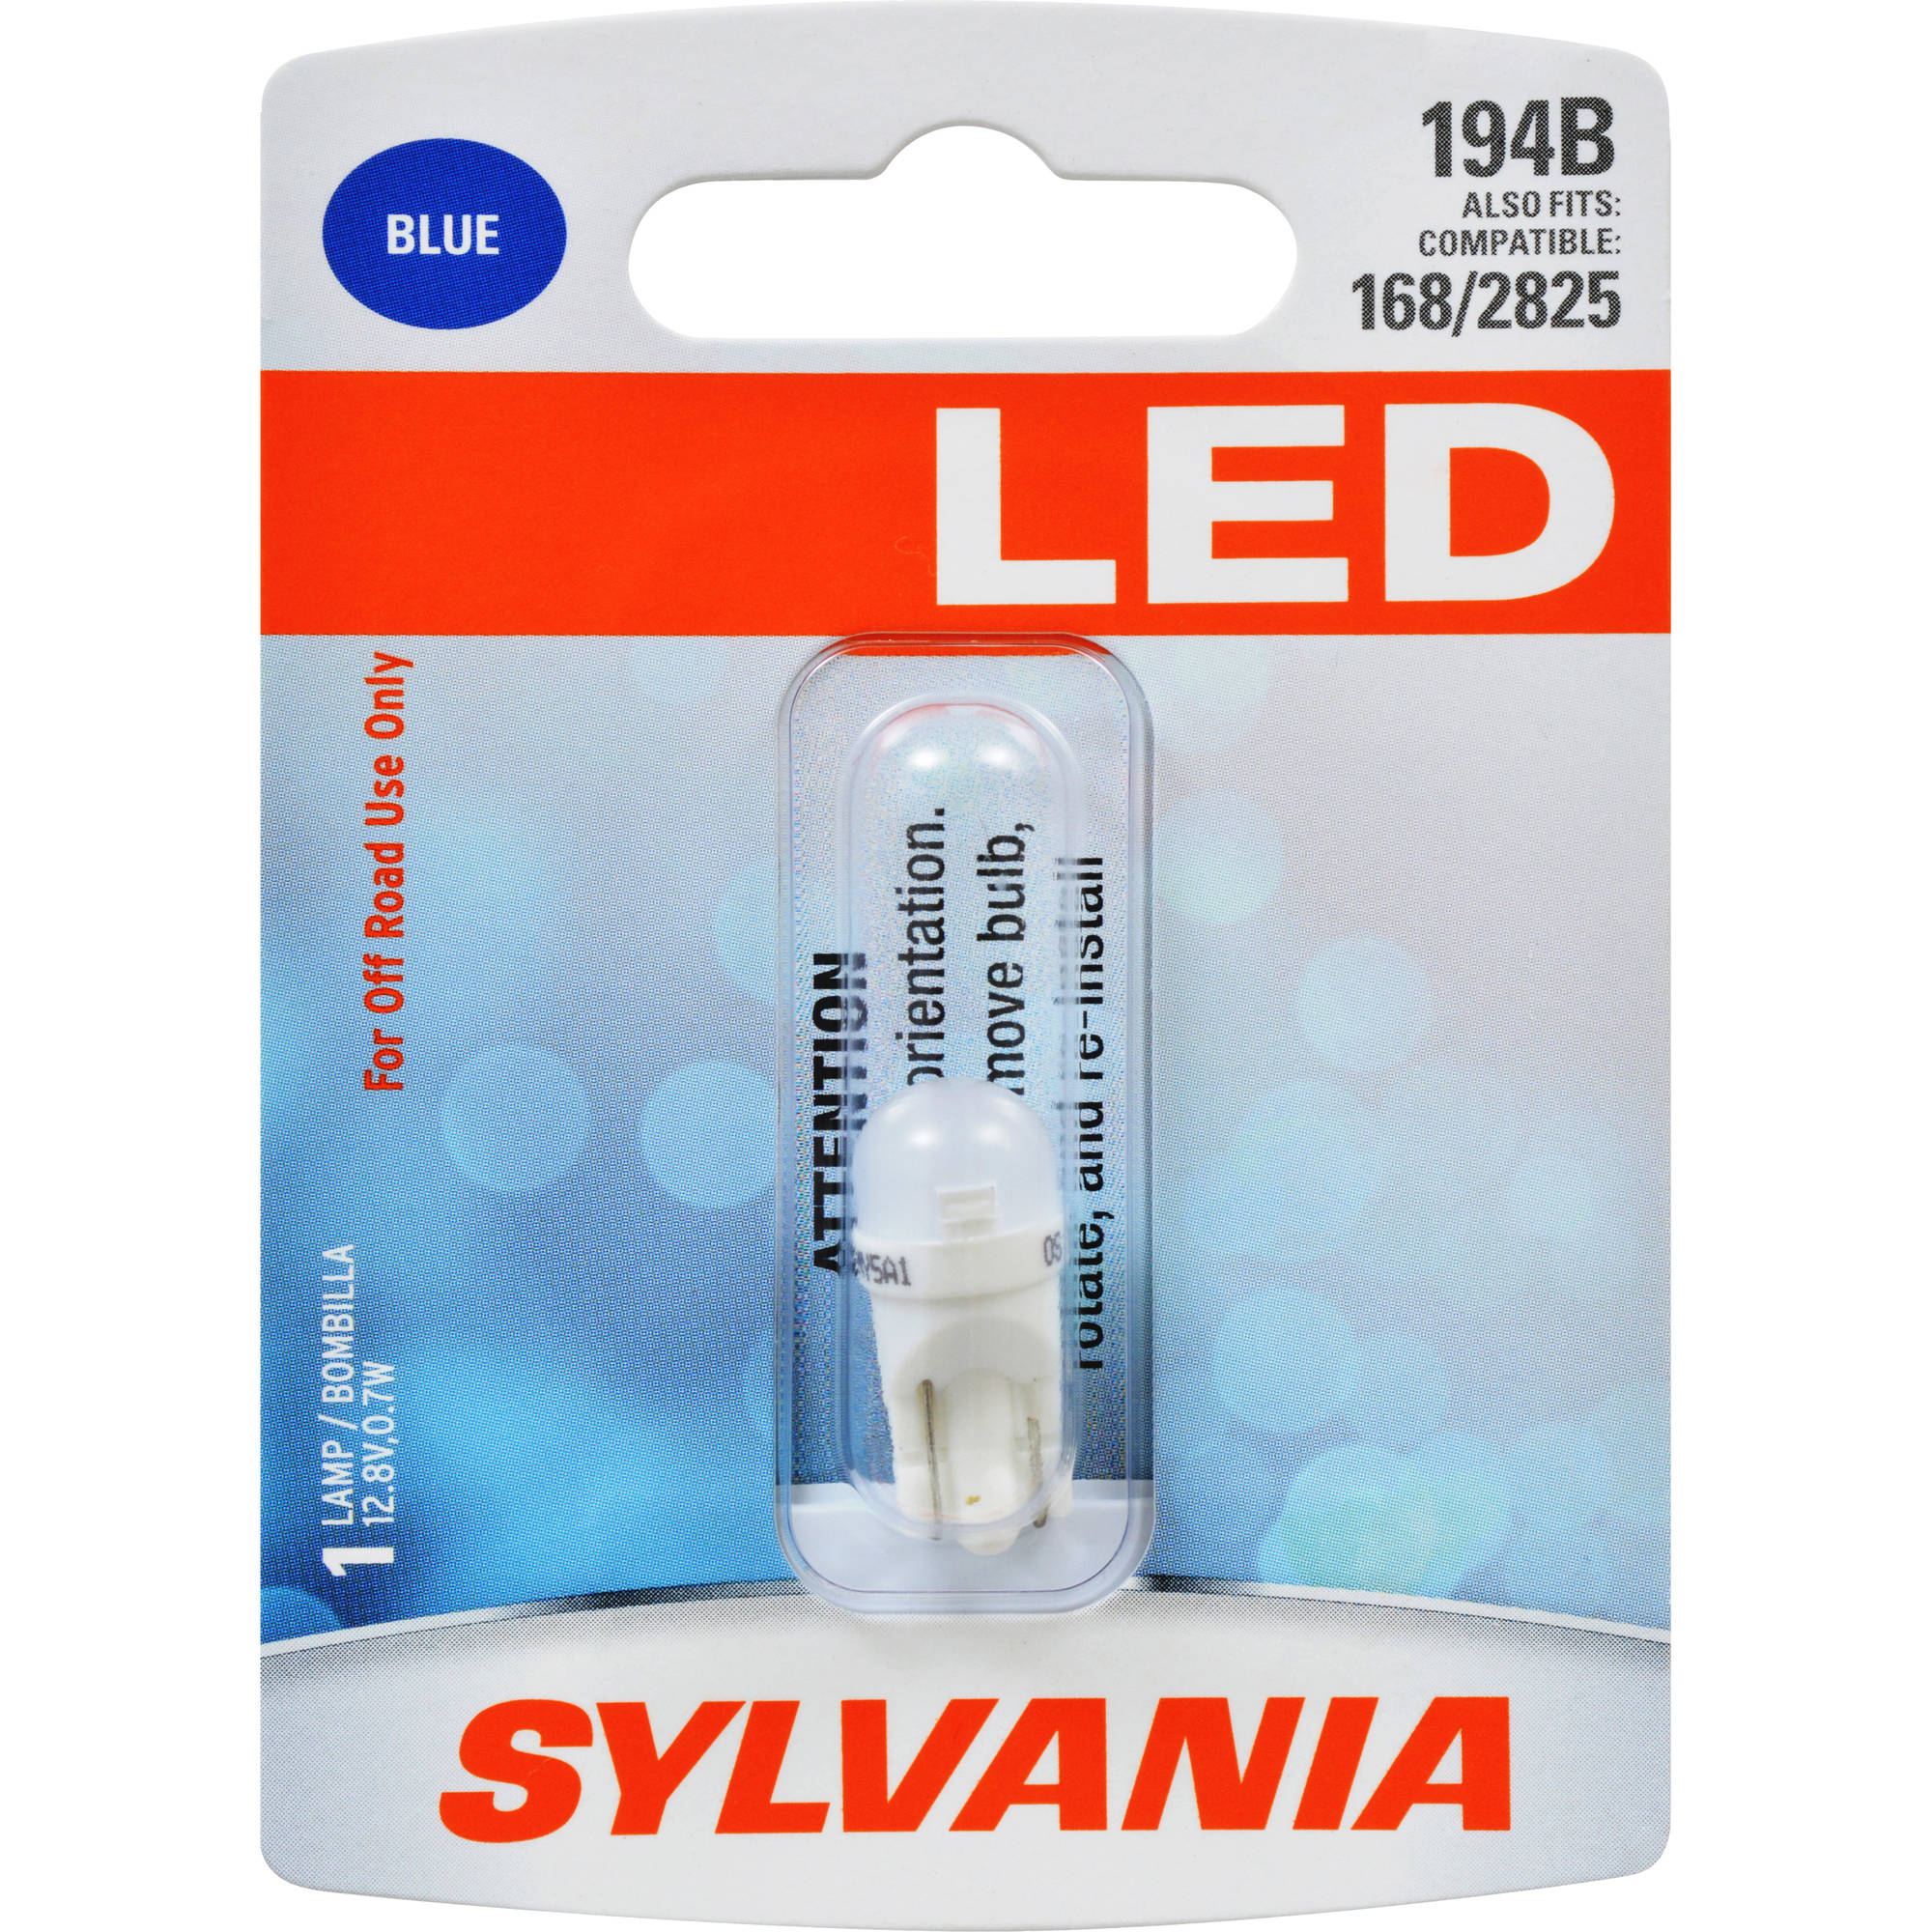 Sylvania 194B SYL LED Mini Bulb, Contains 1 Blue Bulb by Osram Sylvania Inc.